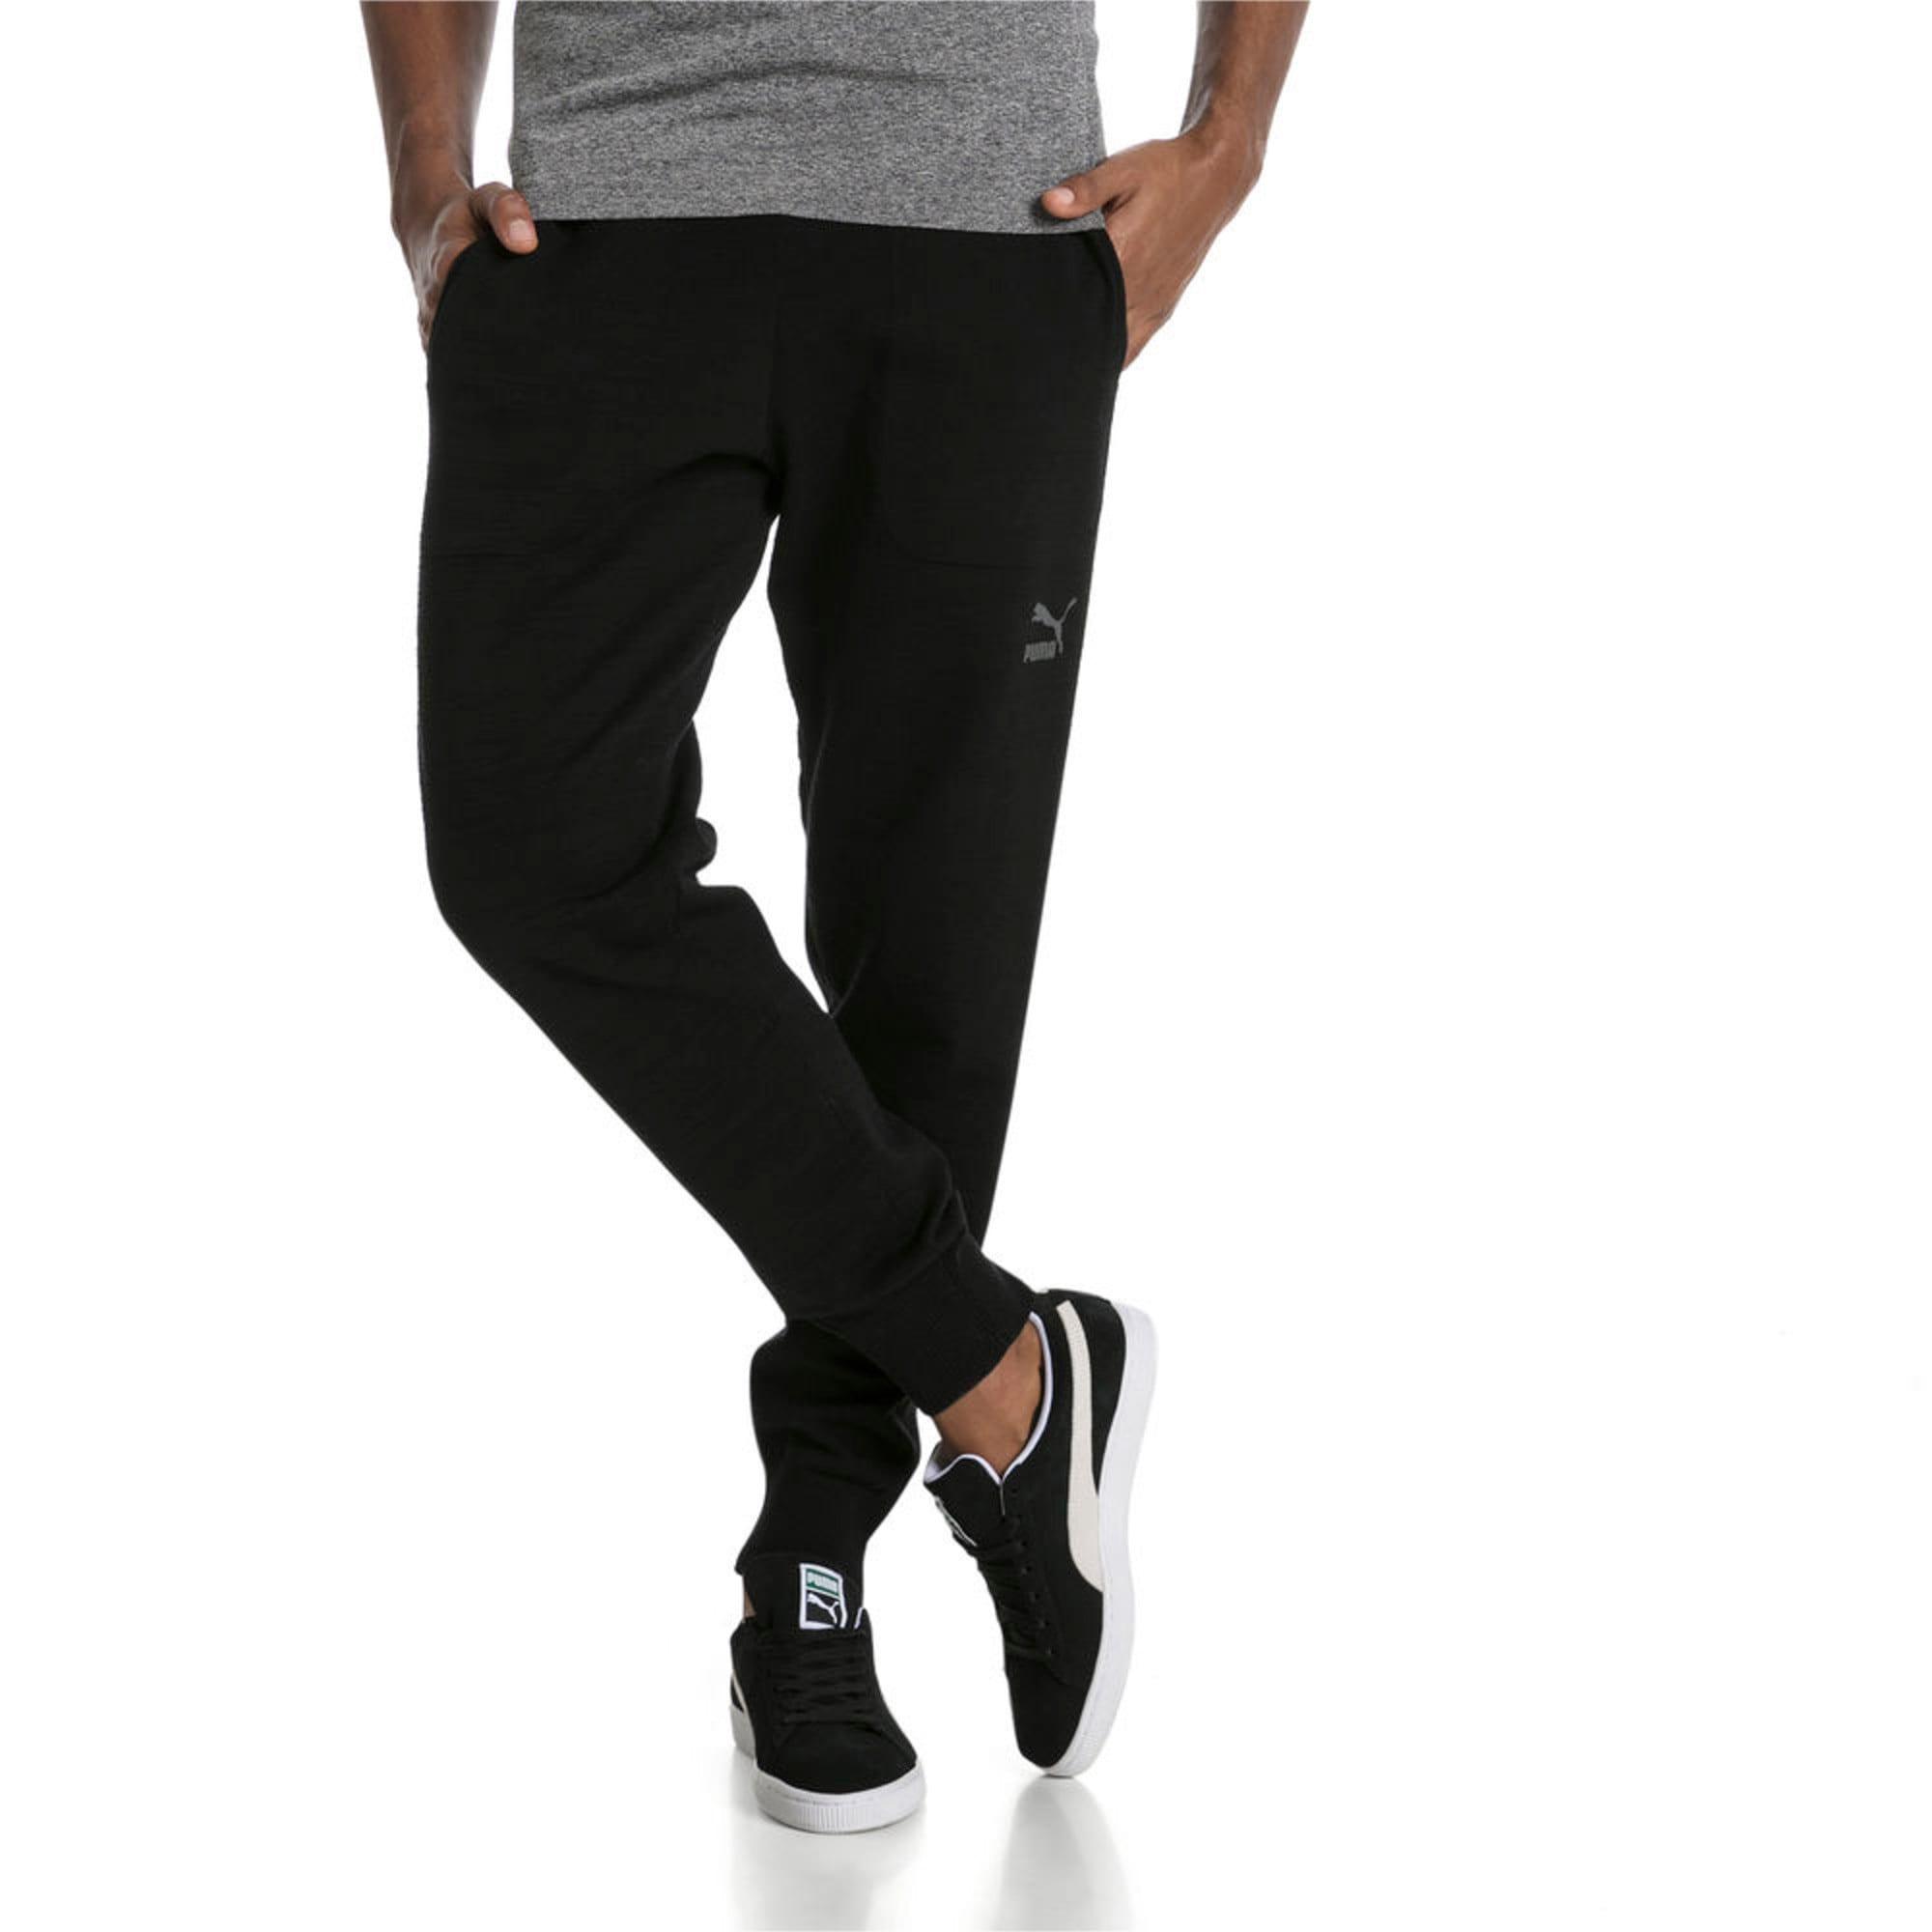 Thumbnail 1 of Men's T7 evoKnit Pants, Puma Black, medium-IND